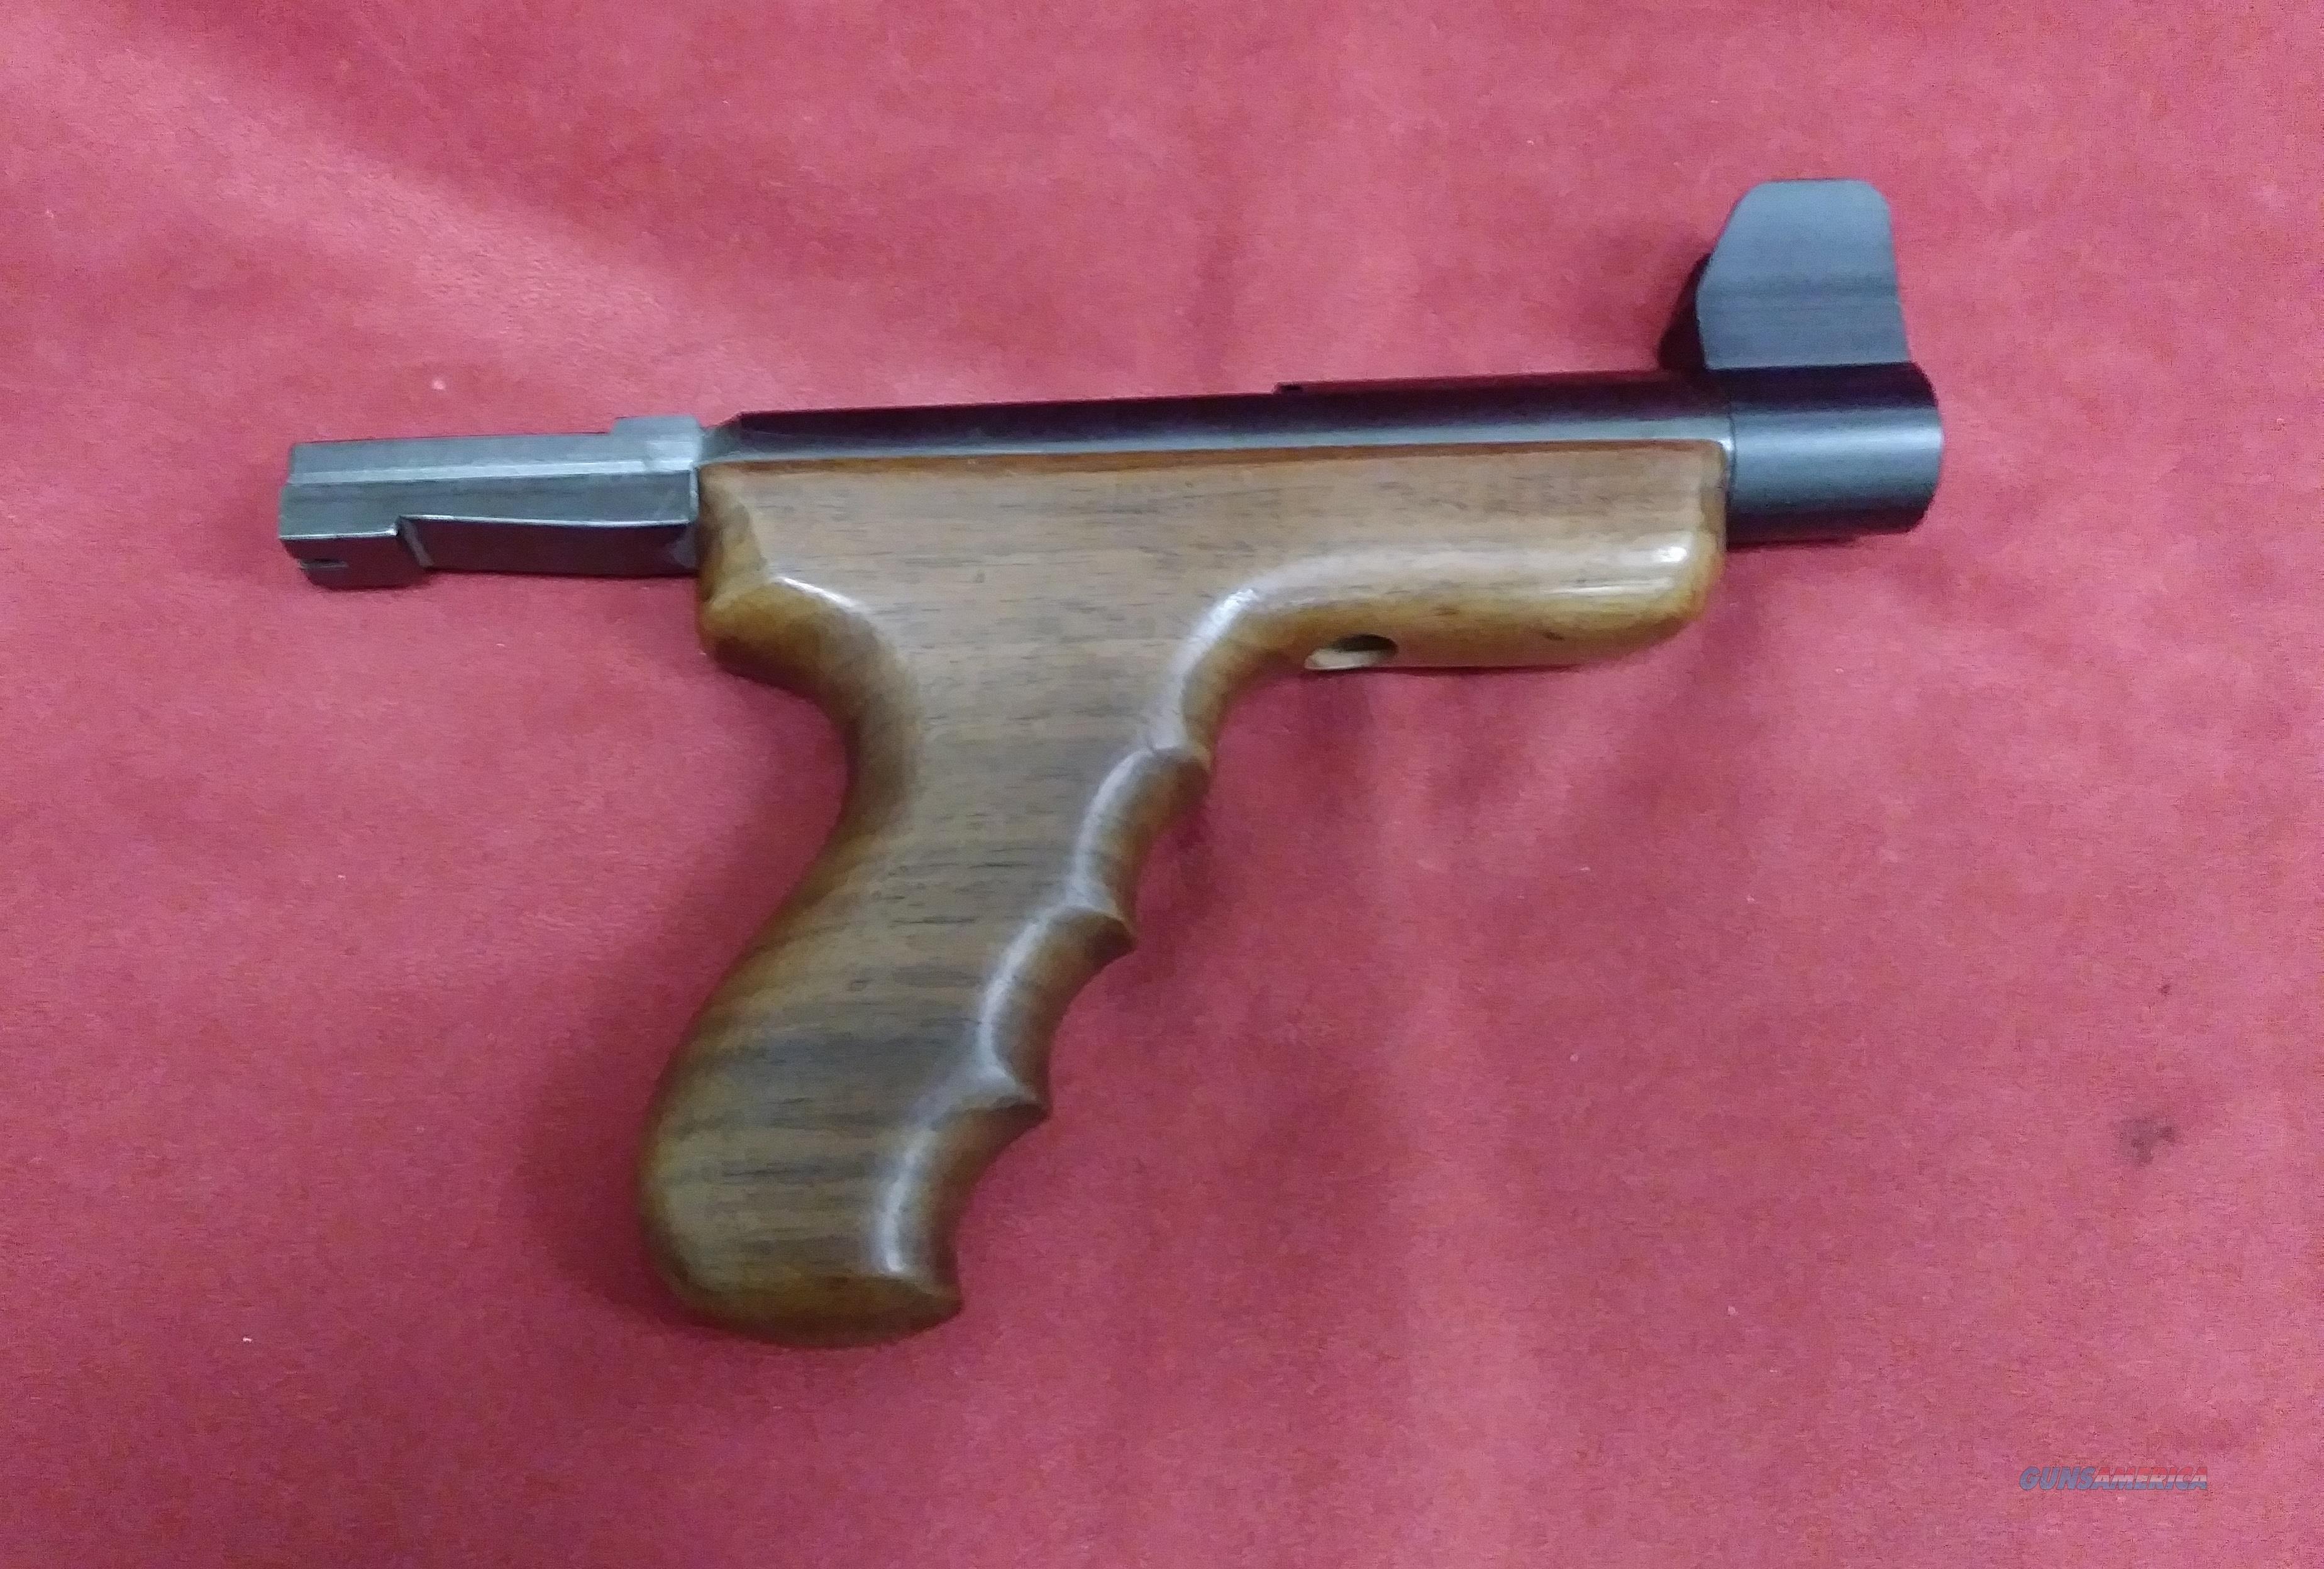 Barrel/Forend Grip for an American Arms Model 180 MK2  Non-Guns > Barrels